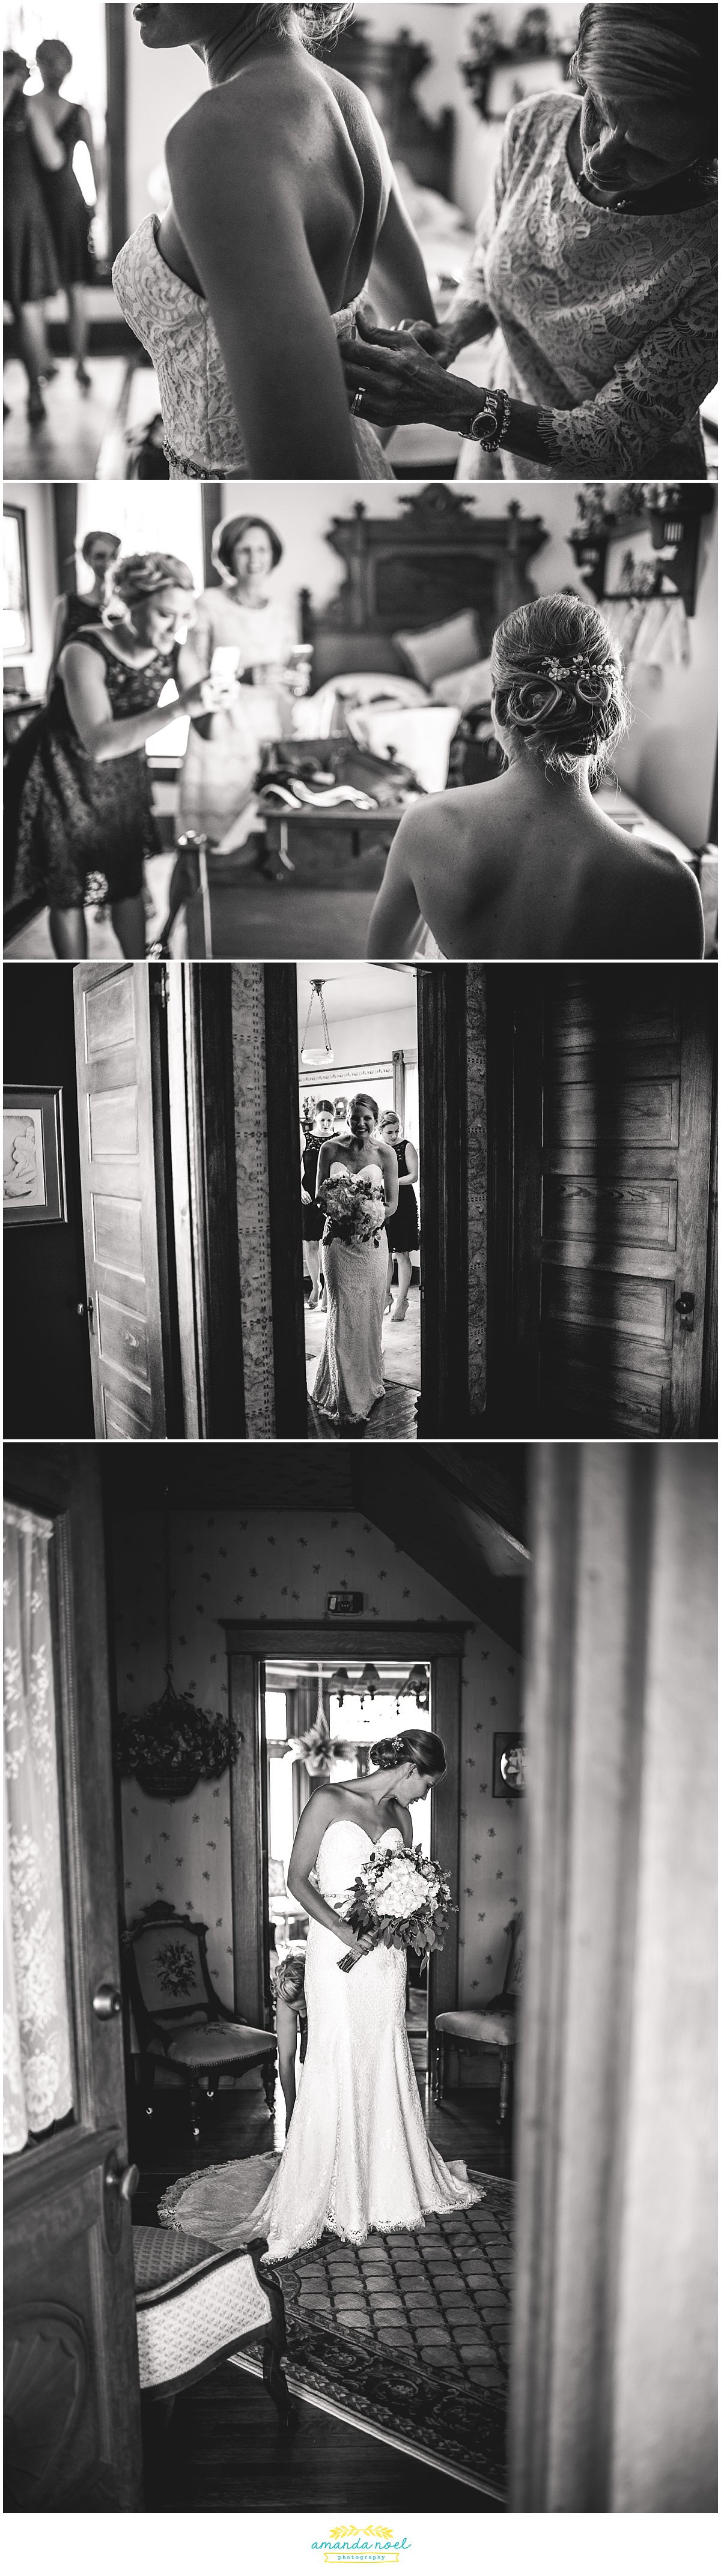 ohio bride getting ready black and white